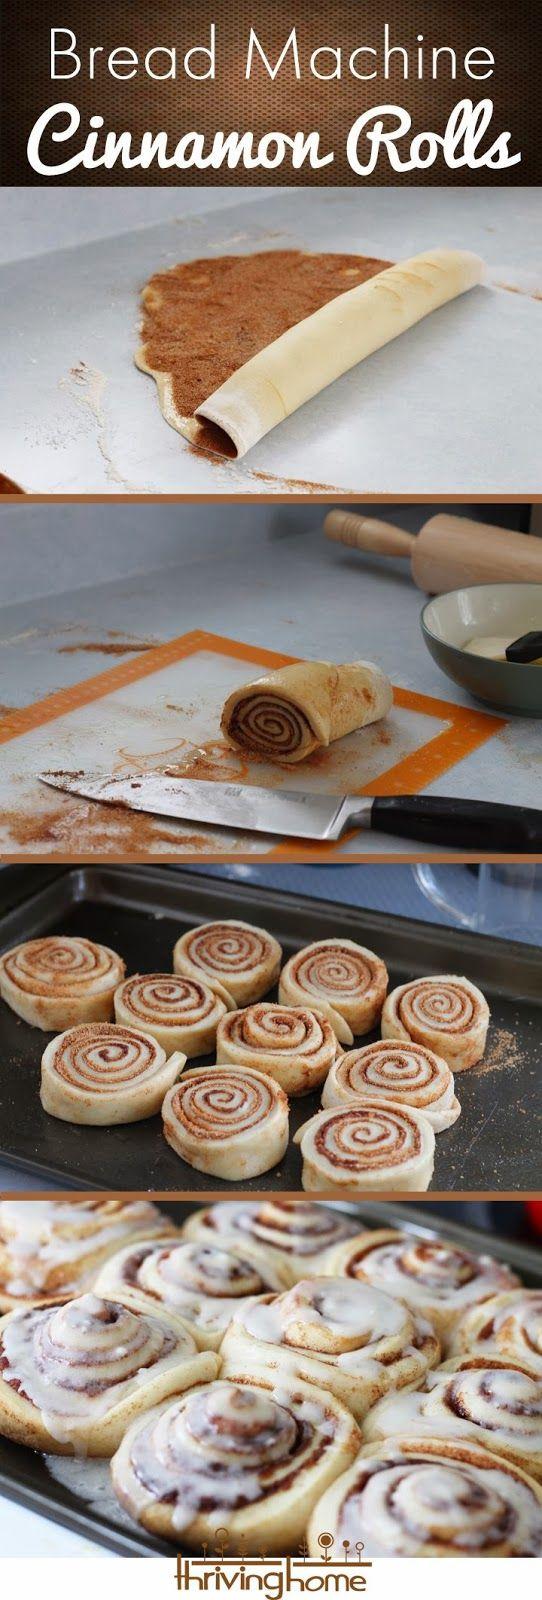 Homemade Cinnamon Rolls – A Bread Machine Recipe - Plan Provision